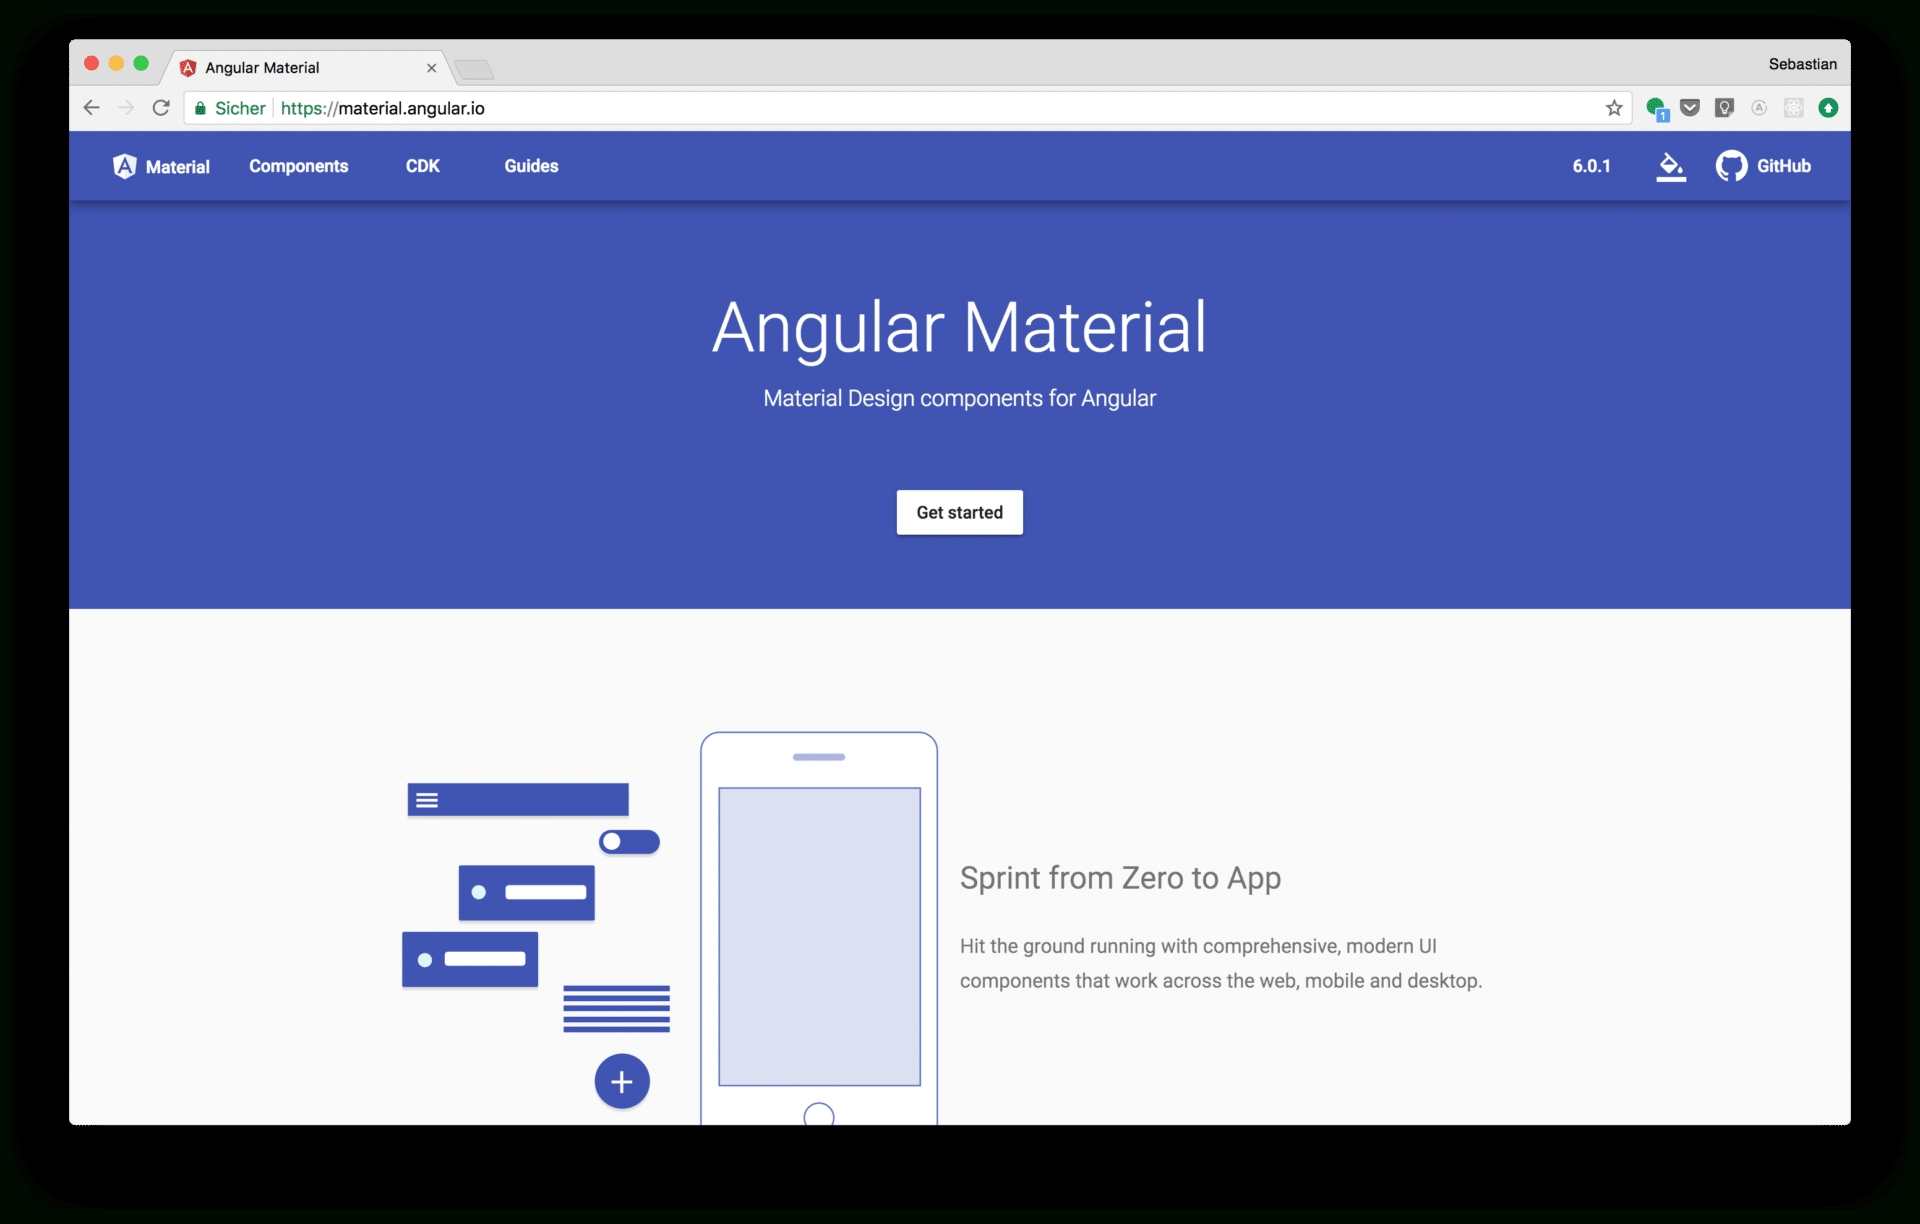 Angular Material And Angular 6 - Material Design For Angular Calendar Icon Angular Material